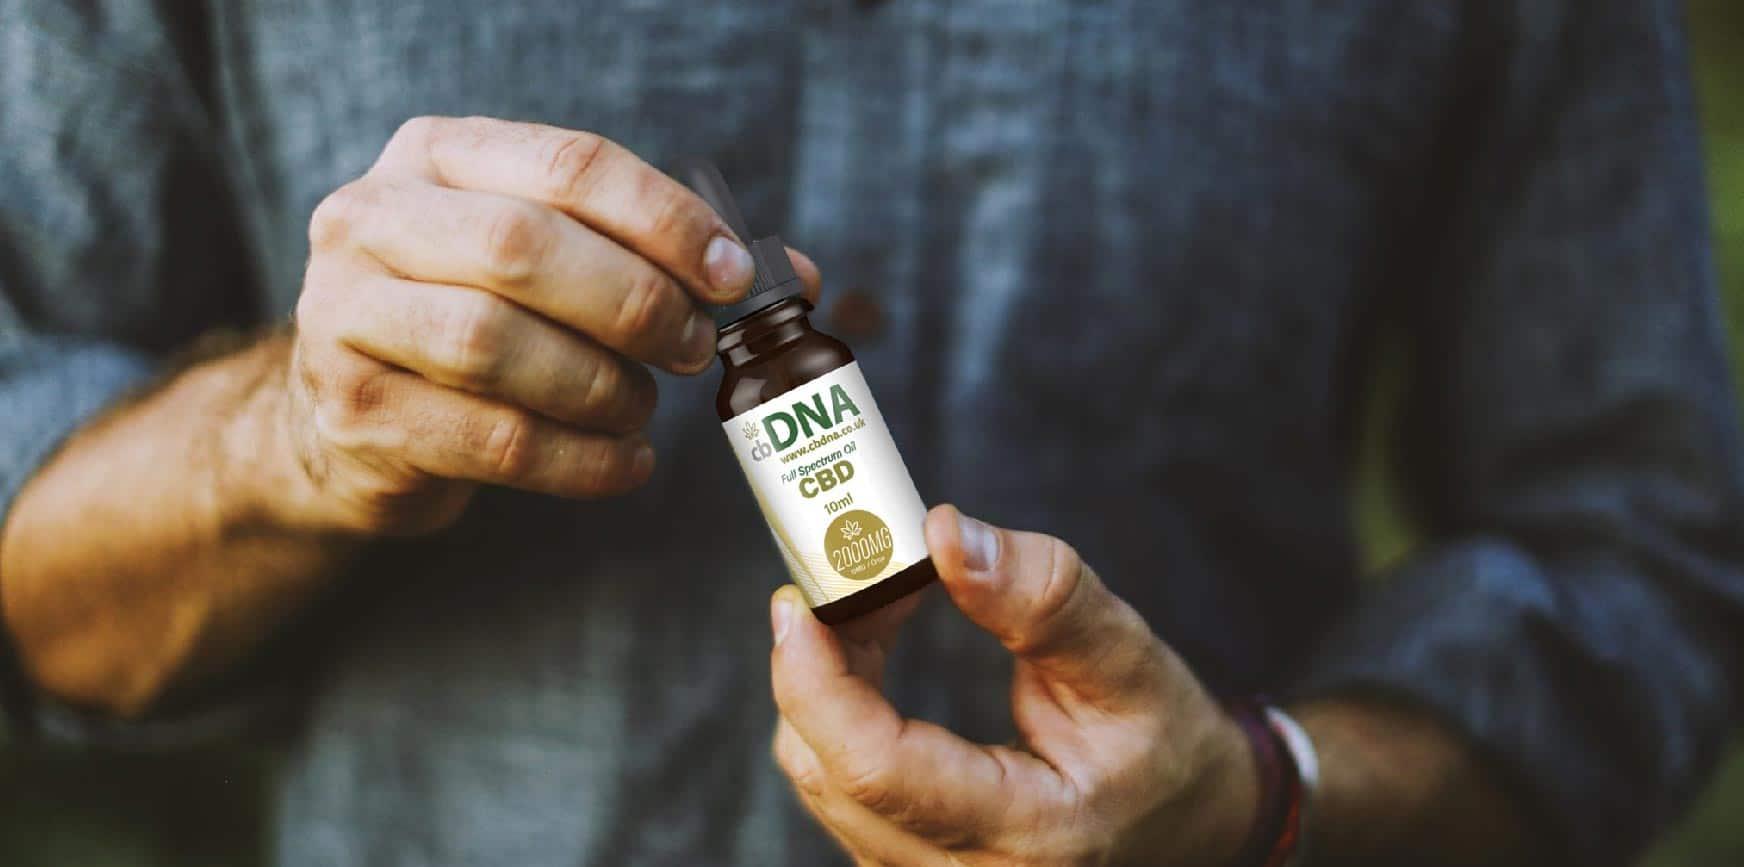 cbDNA Organic CBD Oil 02